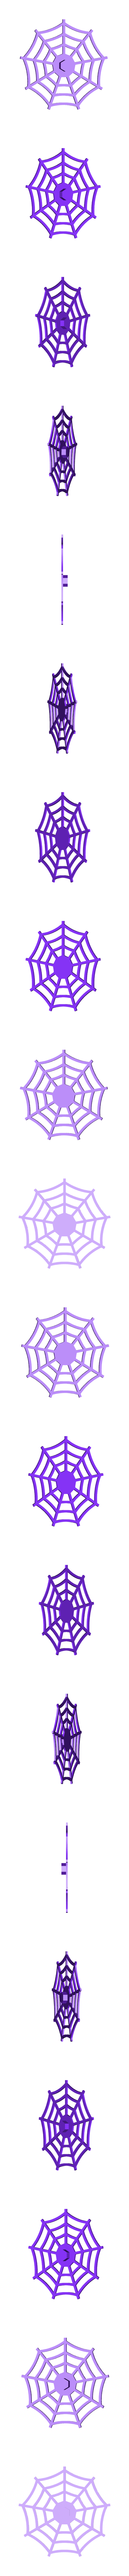 Web.stl Download free STL file Visions of Halloween Danced In Her (His) Head, Hand Cranked • 3D printing model, gzumwalt